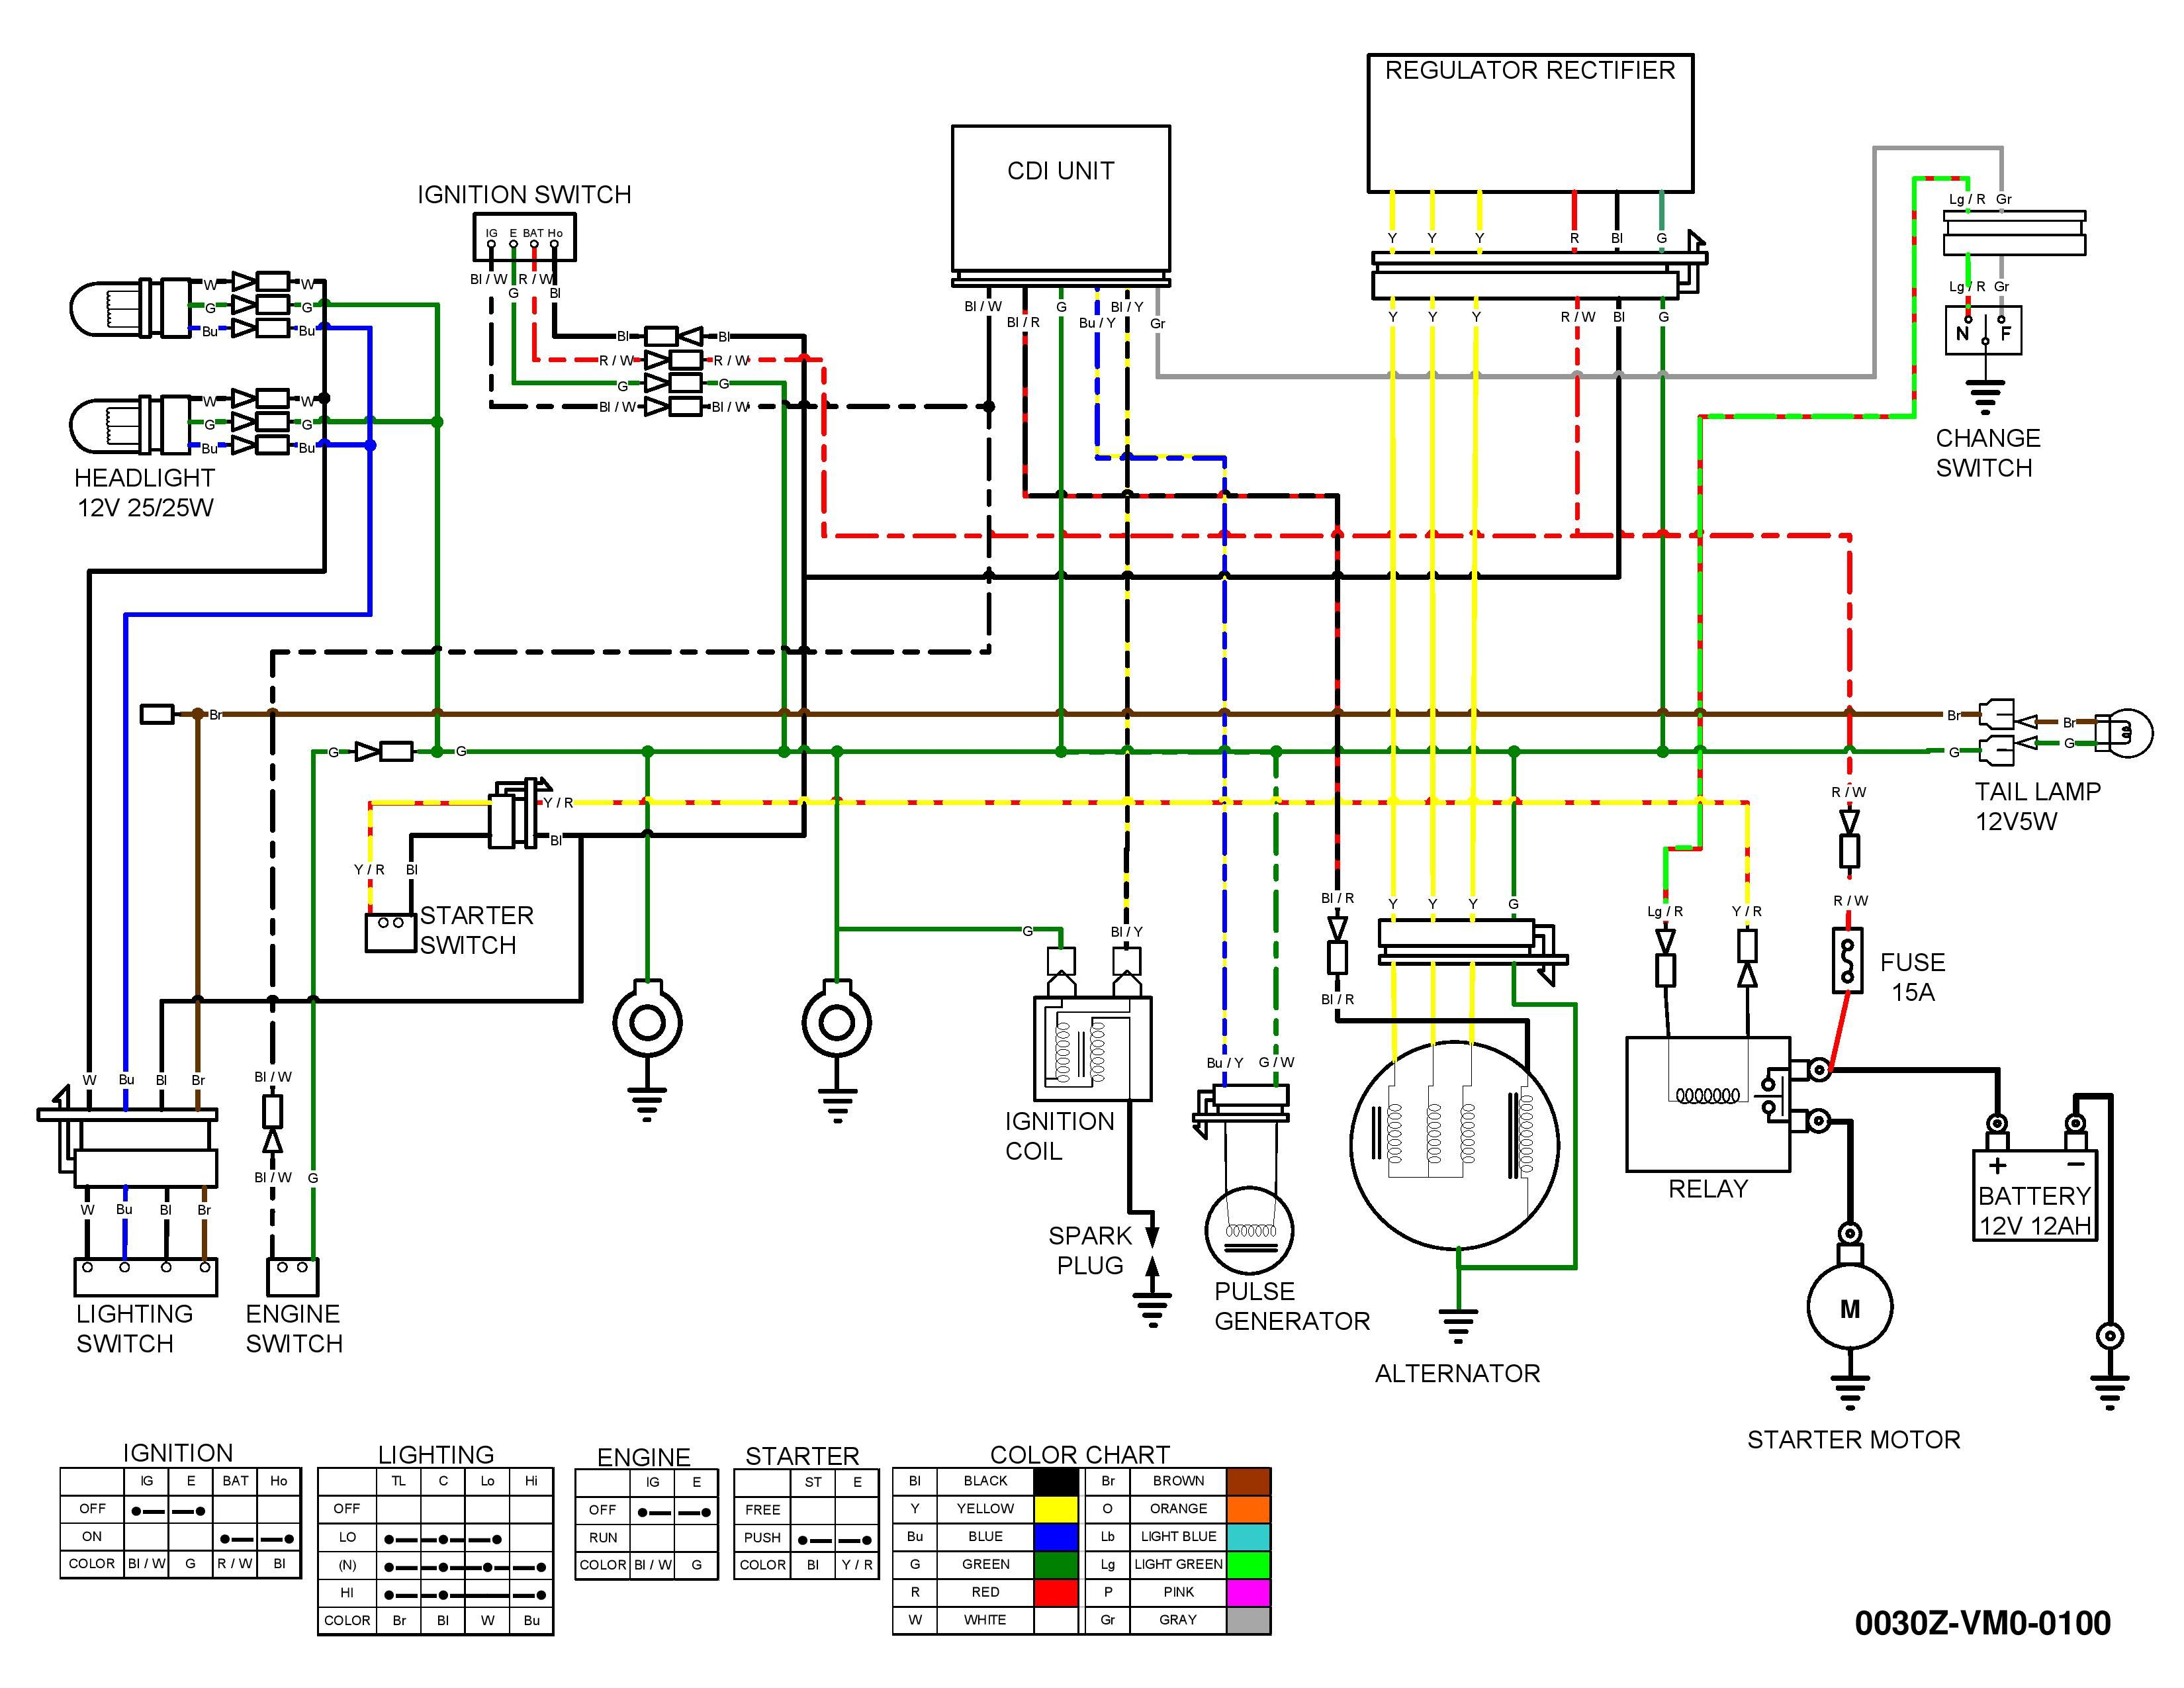 2003 honda crv ac wiring diagram hpm sensor 1985 odyssey fl350